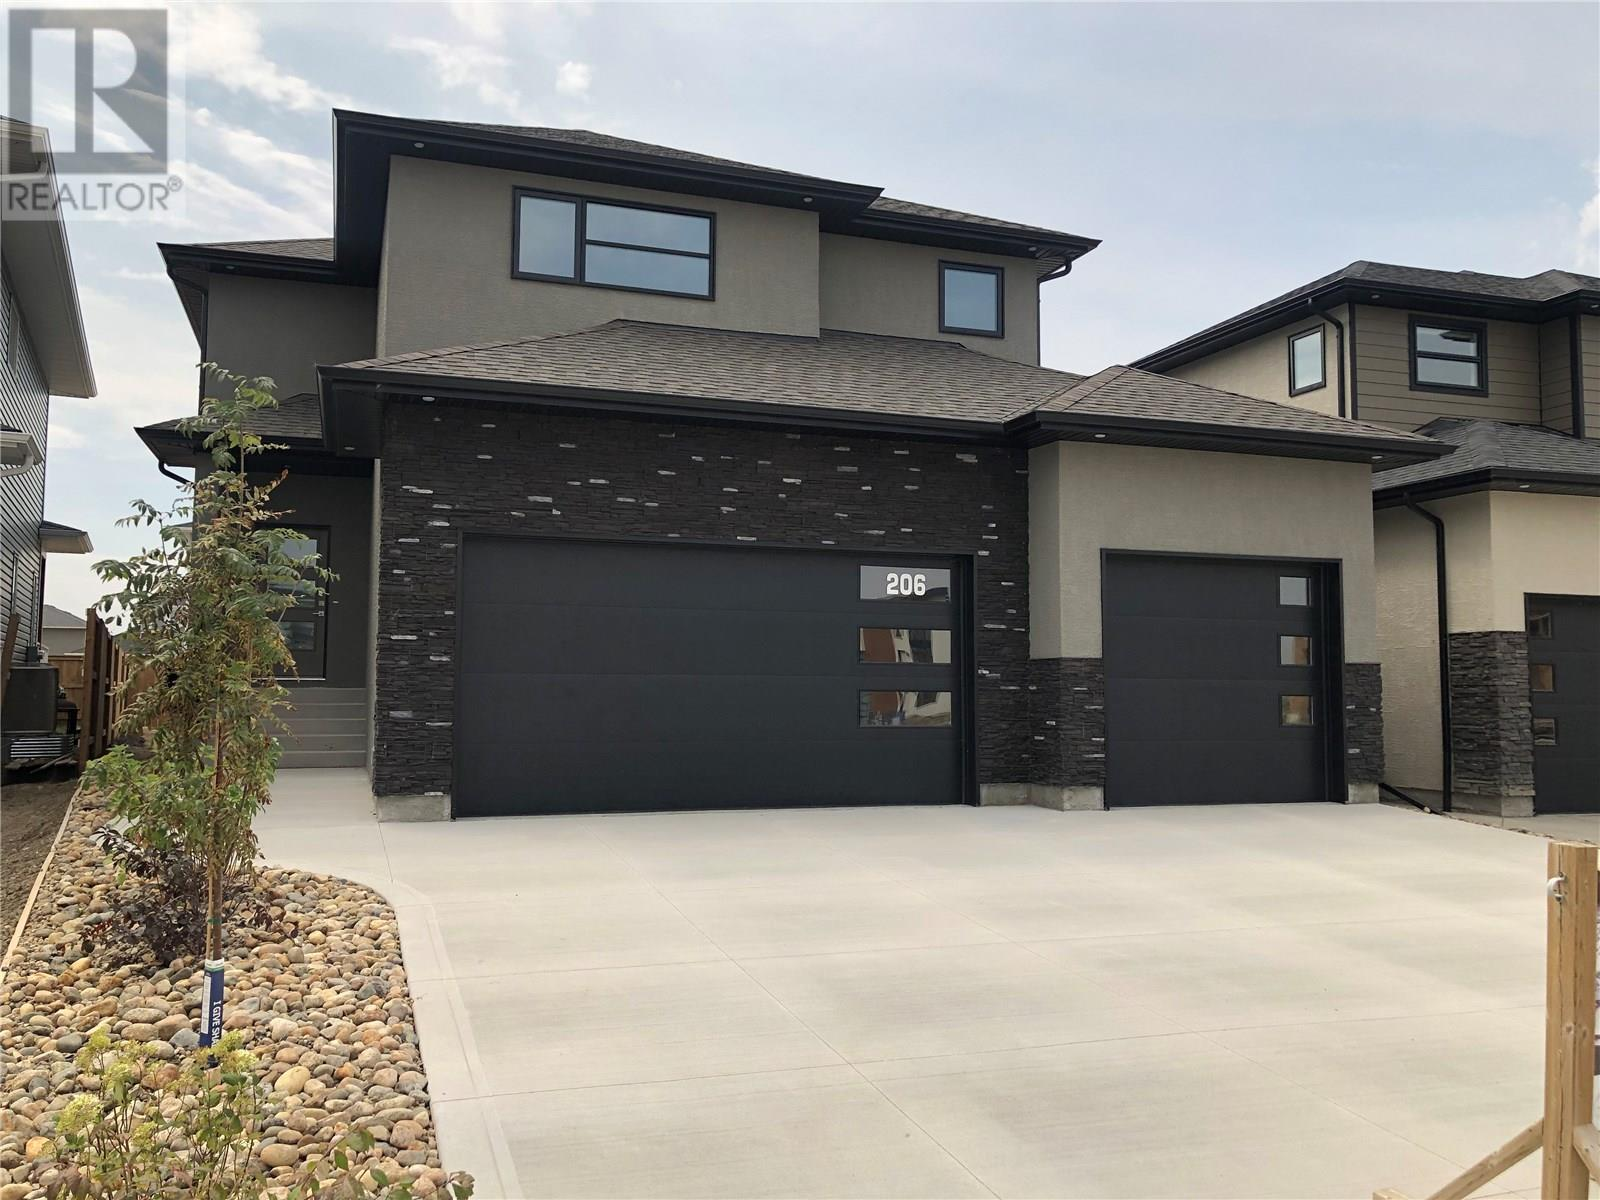 206 Kenaschuk UN, saskatoon, Saskatchewan